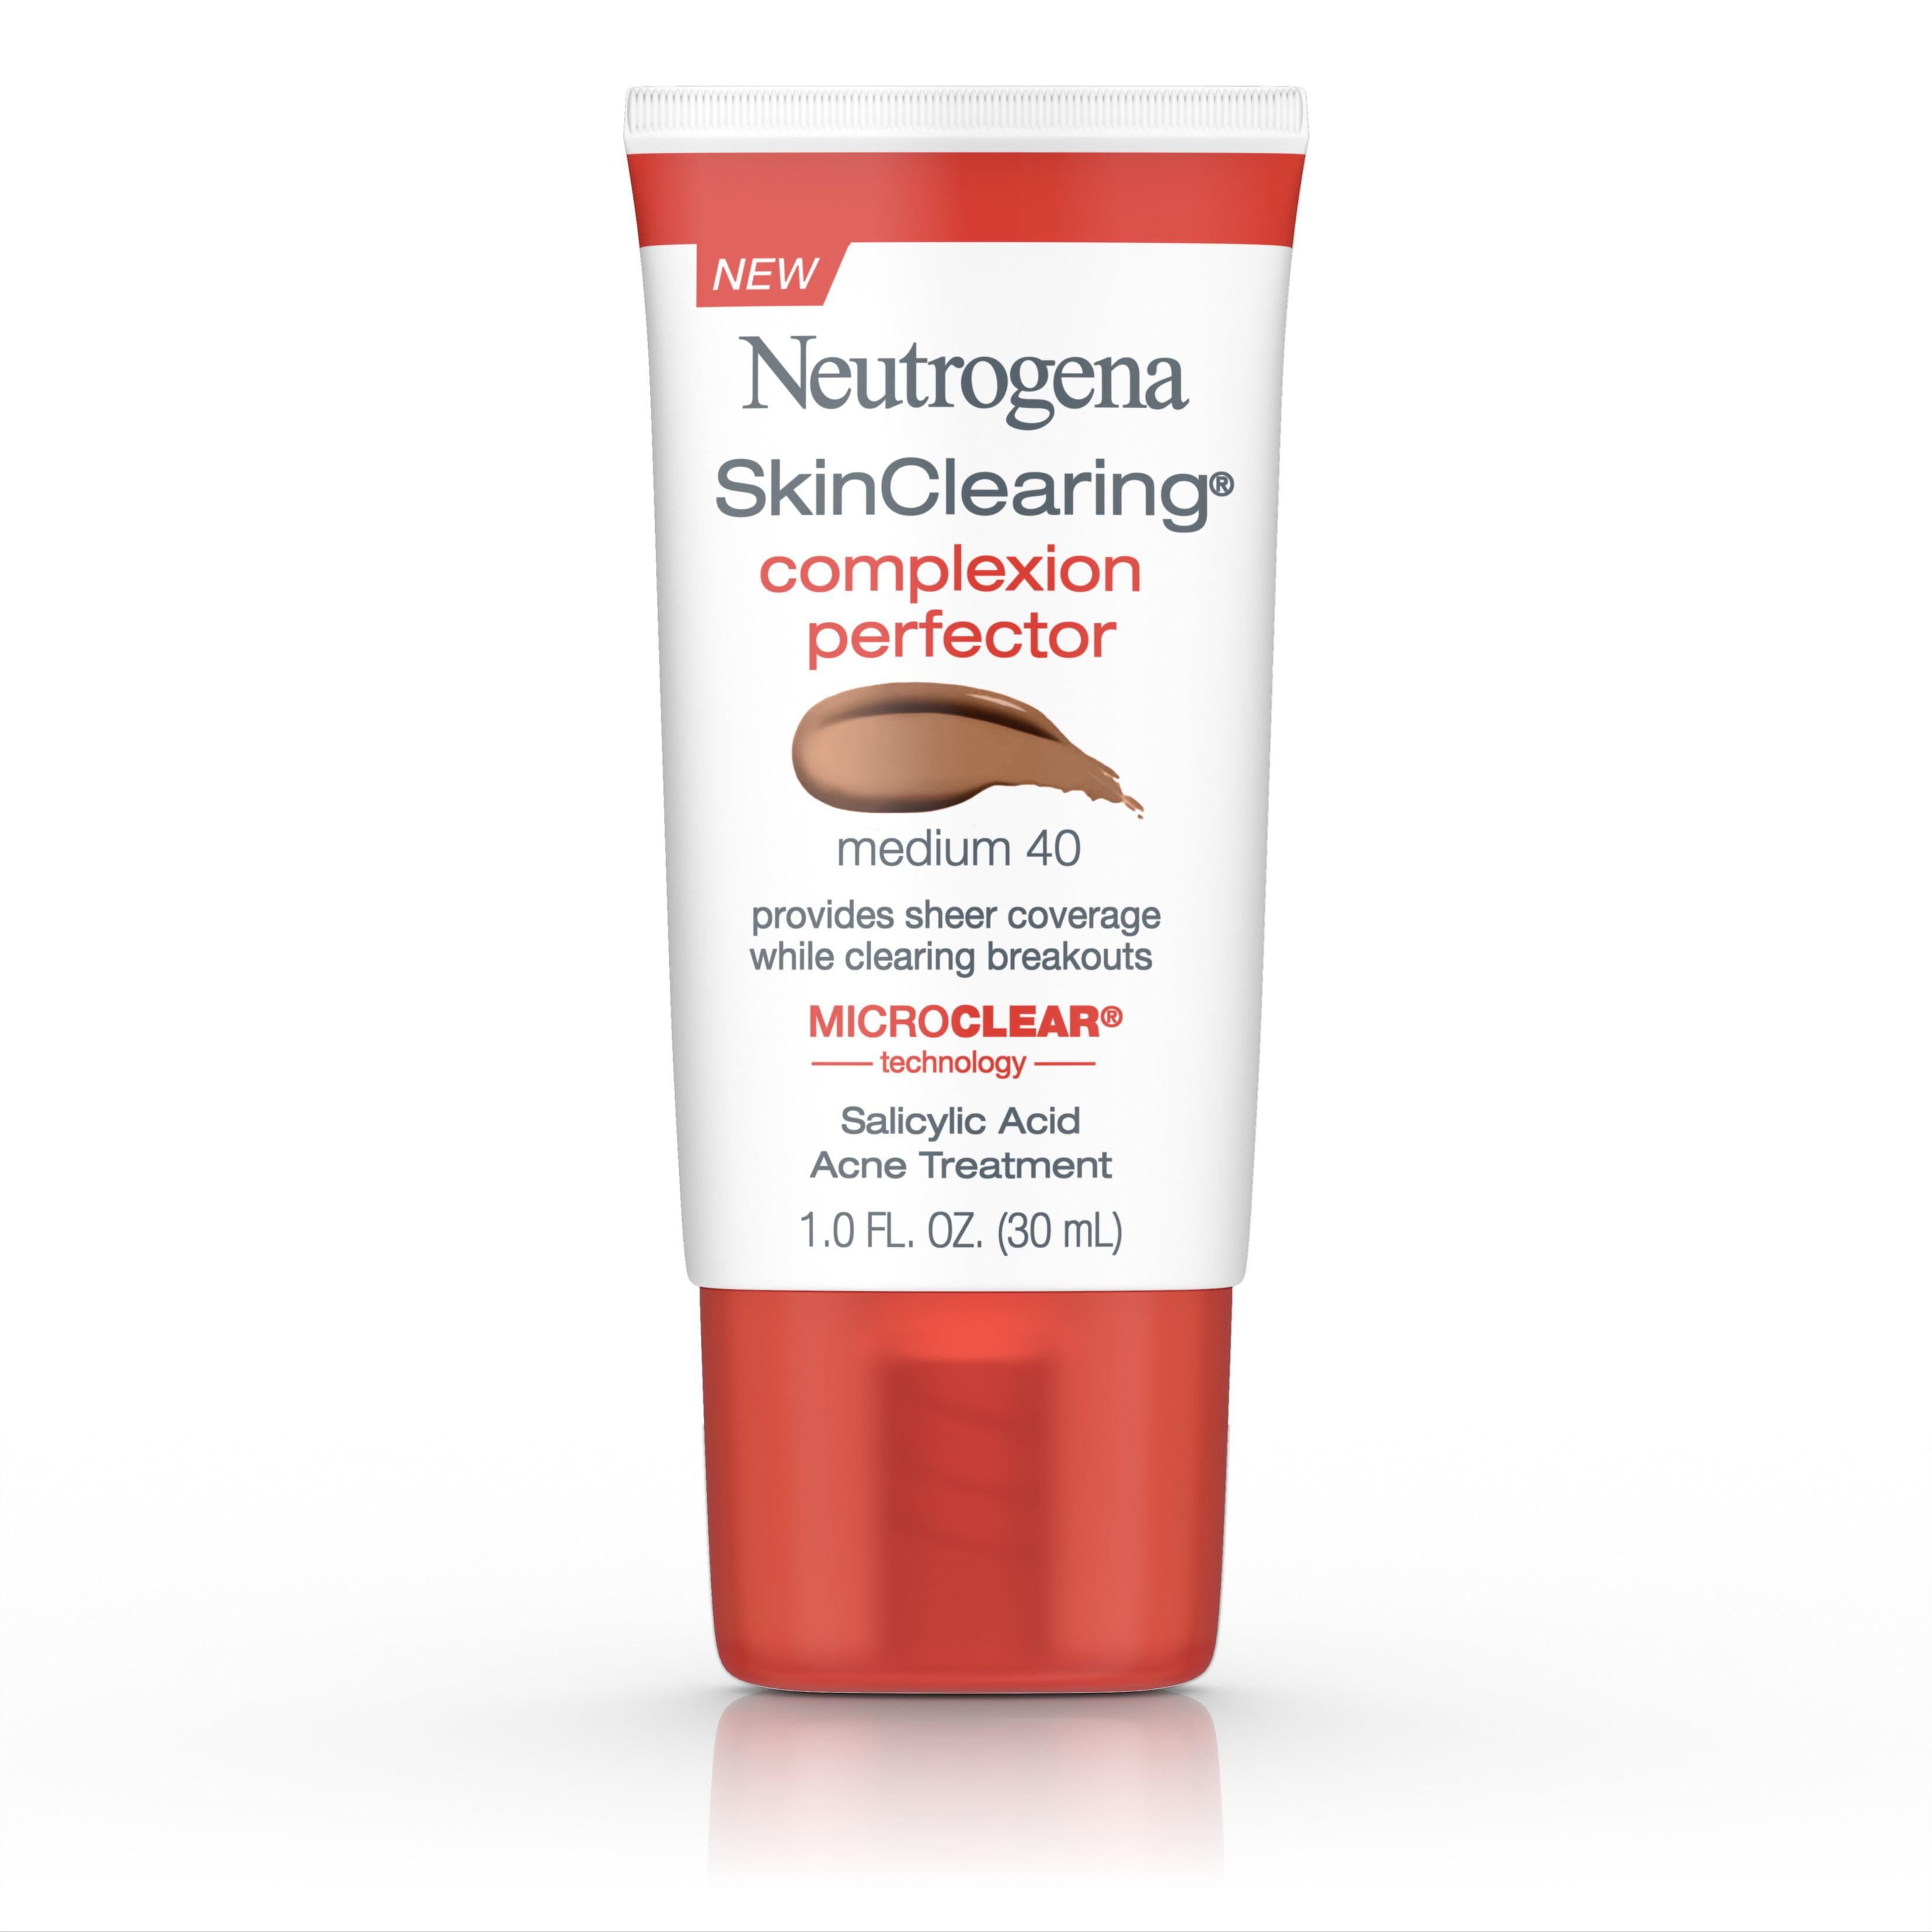 Neutrogena Skinclearing Complexion Perfector With Salicylic Acid, Medium, 1 Fl. Oz.